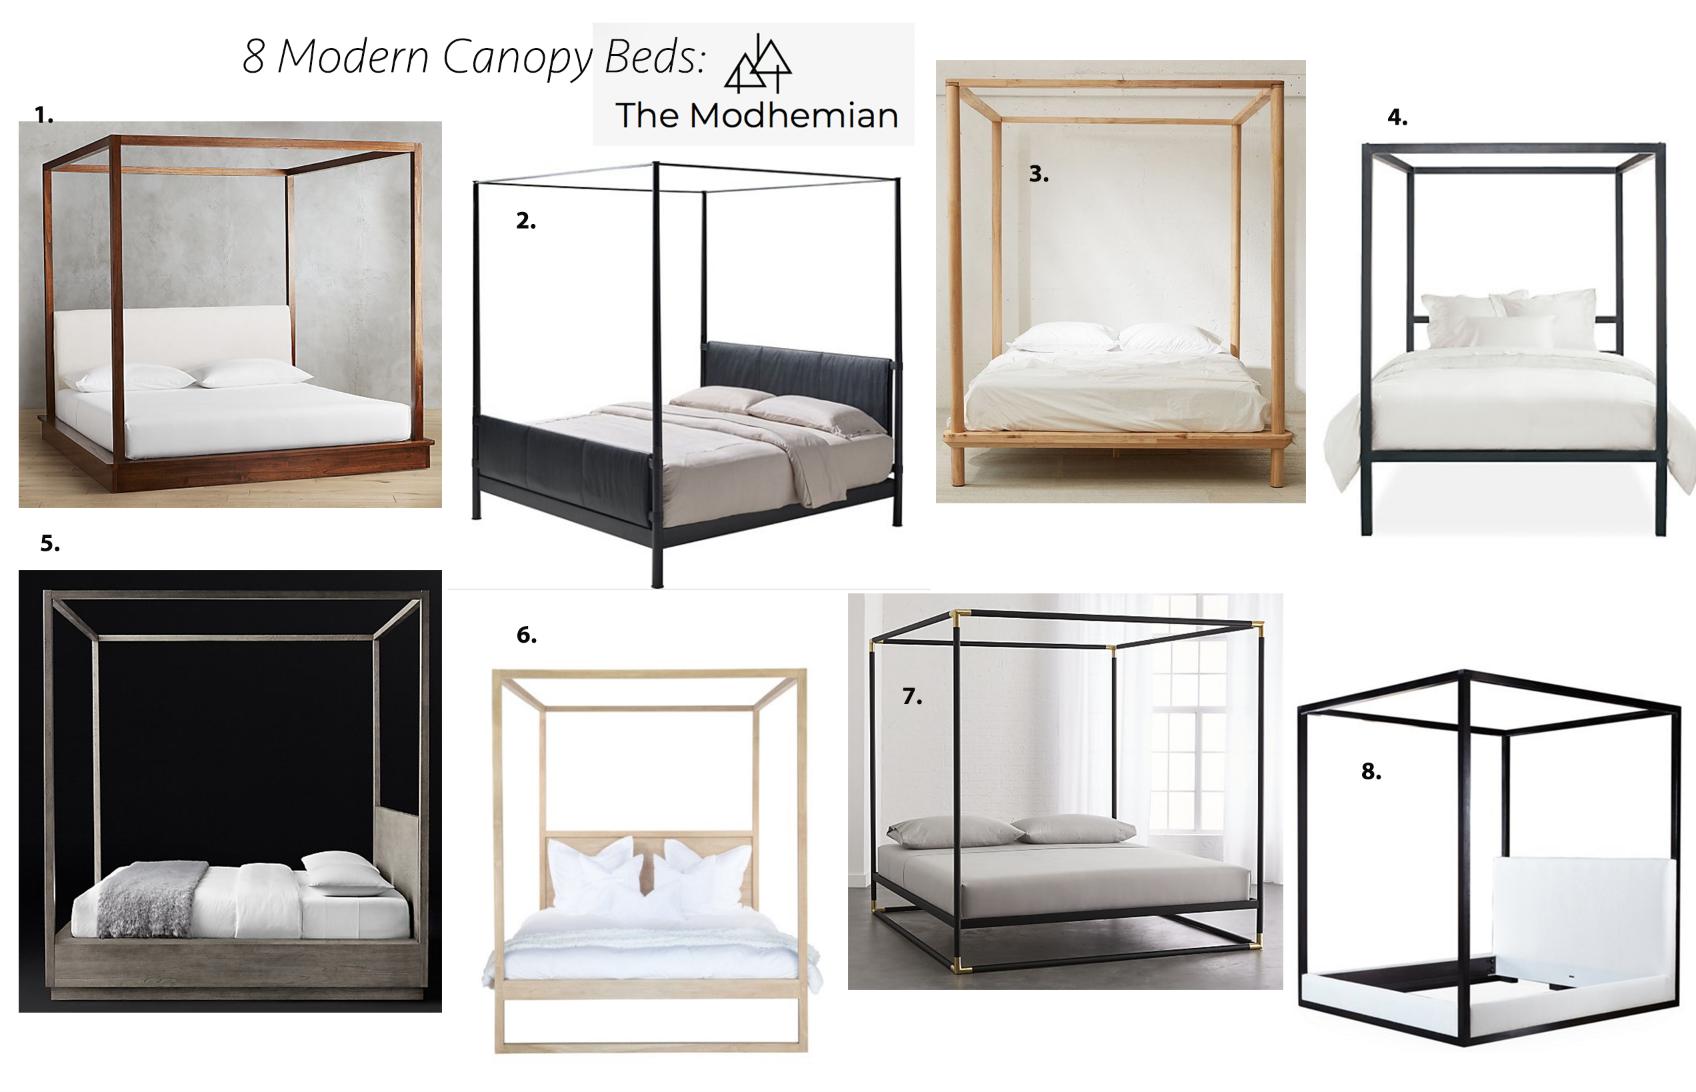 The Modhemian Blog, 8 modern canopy beds